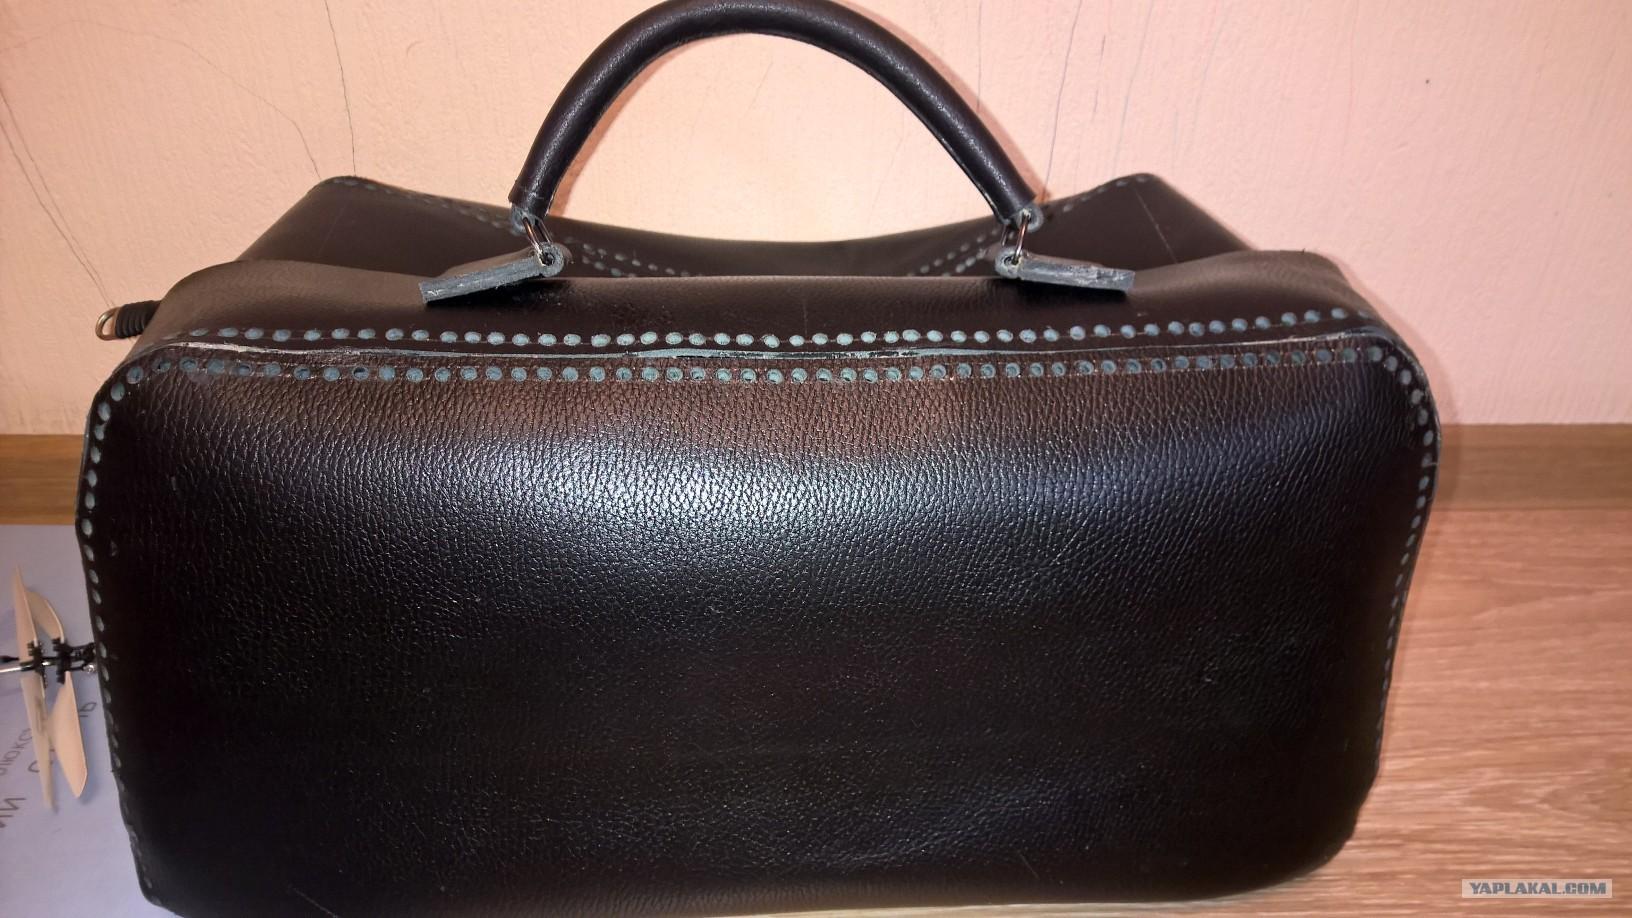 7cbb1466b7e2 Дорожная сумка из кожи своими руками (около 20 фото) - ЯПлакалъ